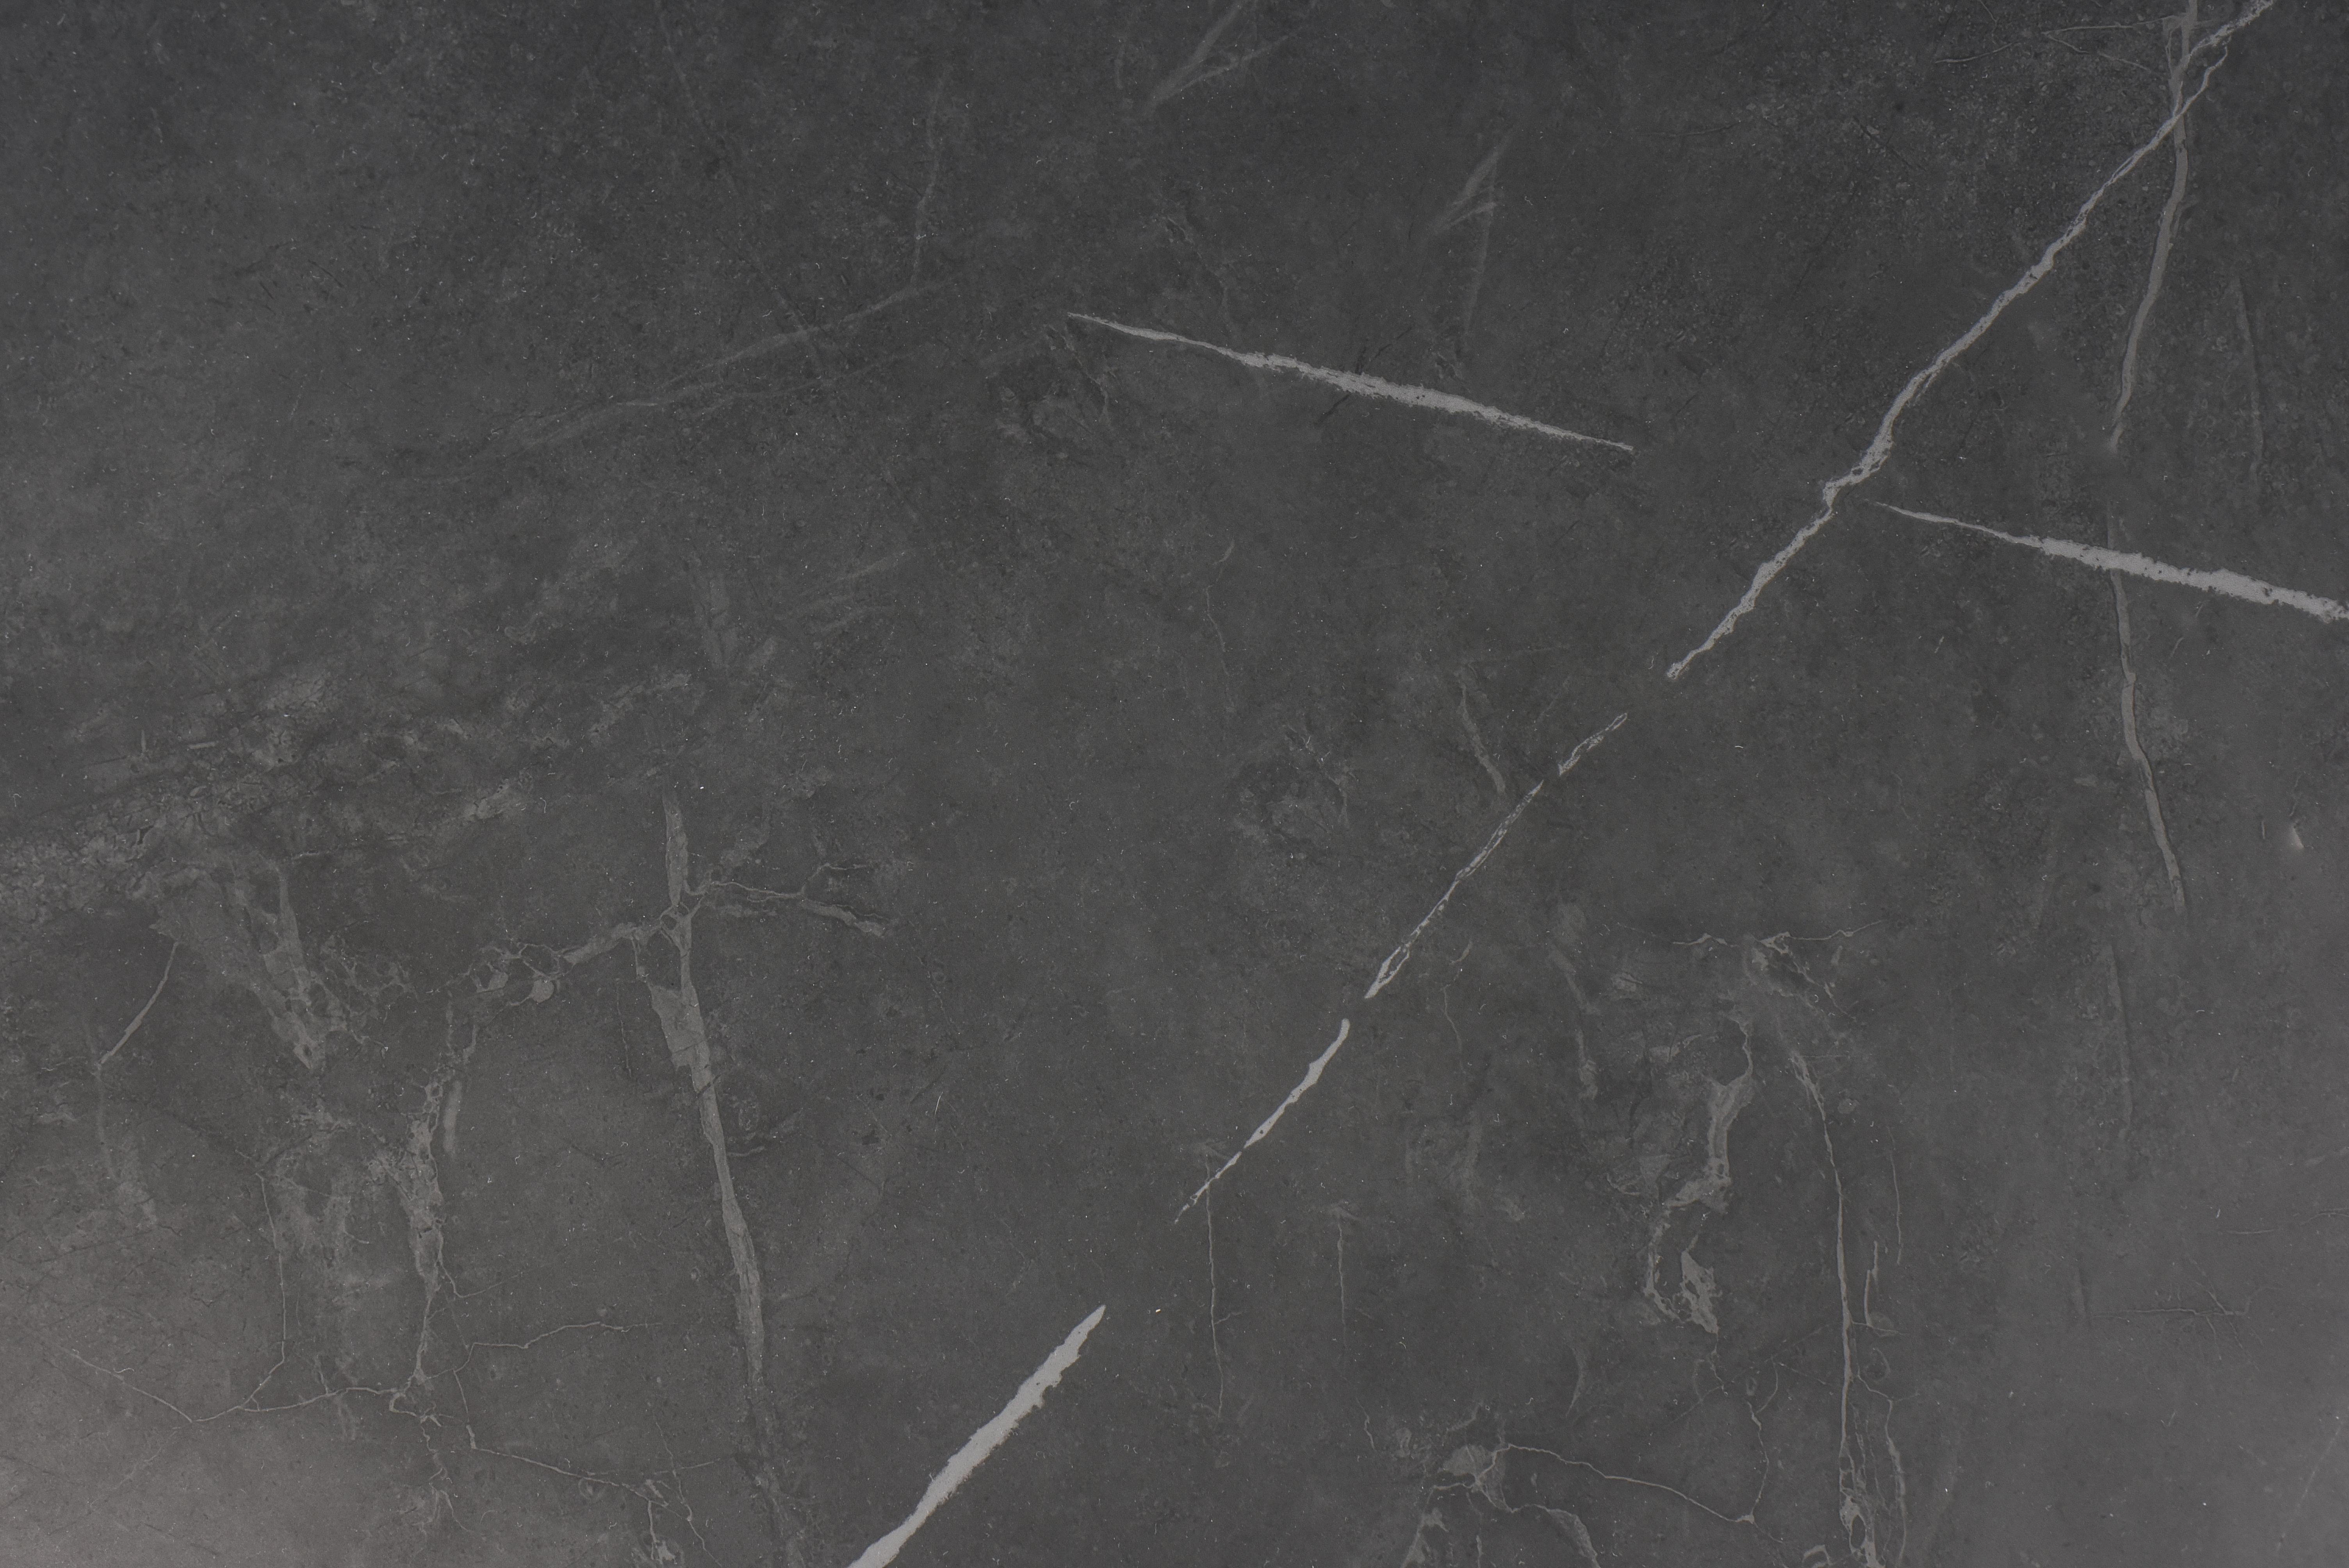 4 Seasons Konos Table 220x95 Ceramic Top - Dk. Grey / Frost